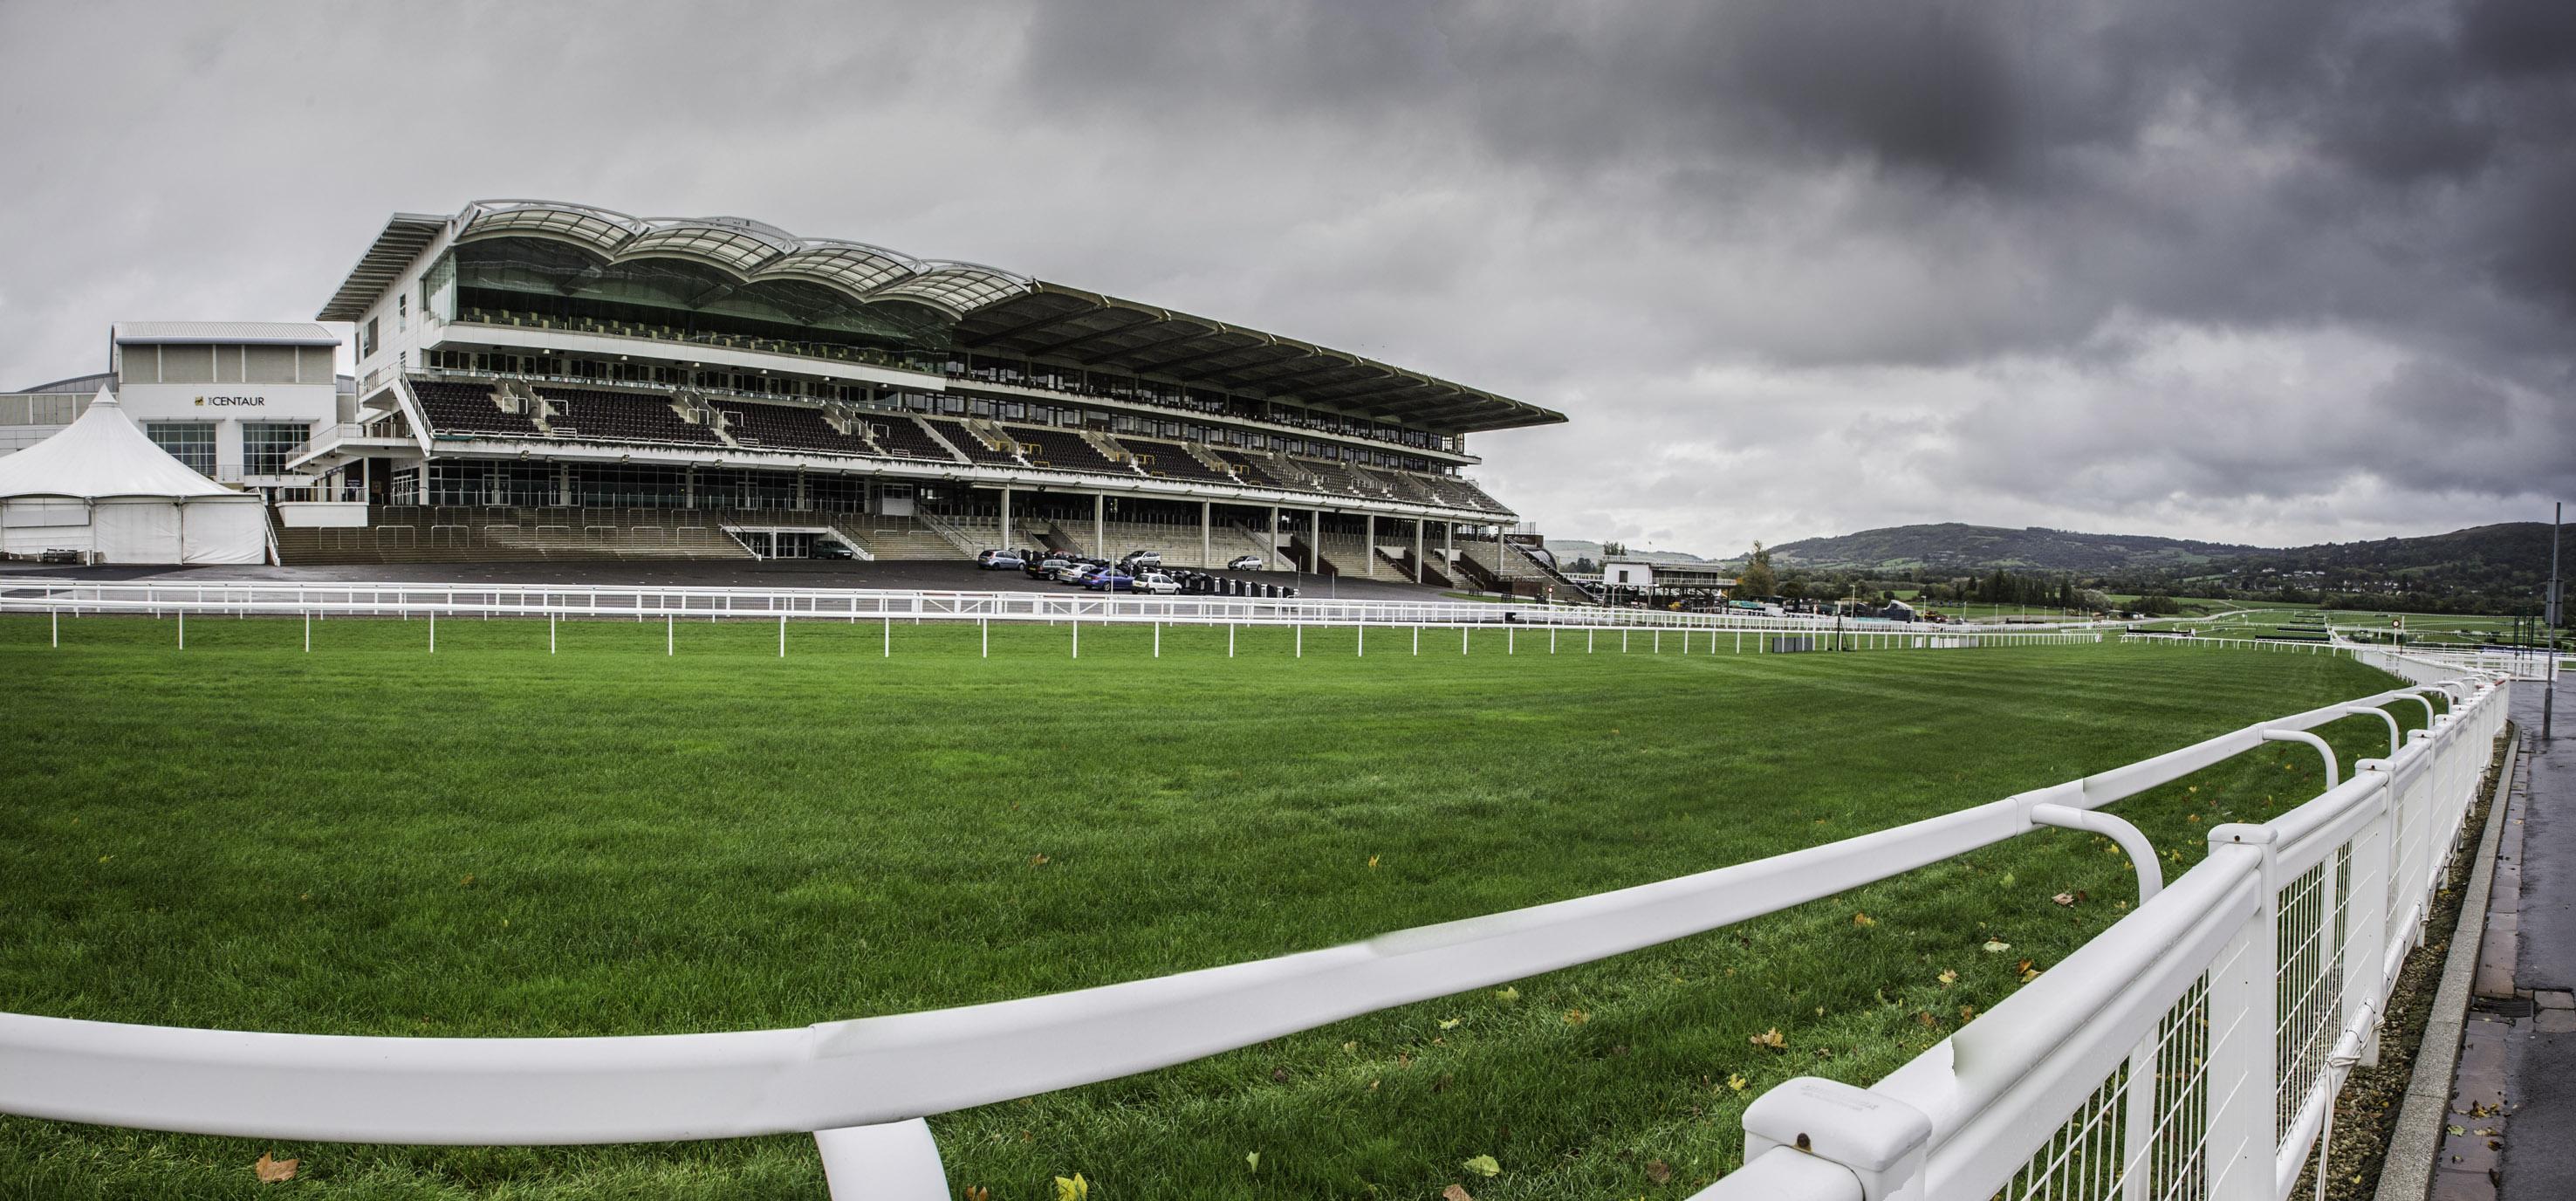 BSEE | Wessex ModuMax is a winner for Cheltenham racecourse